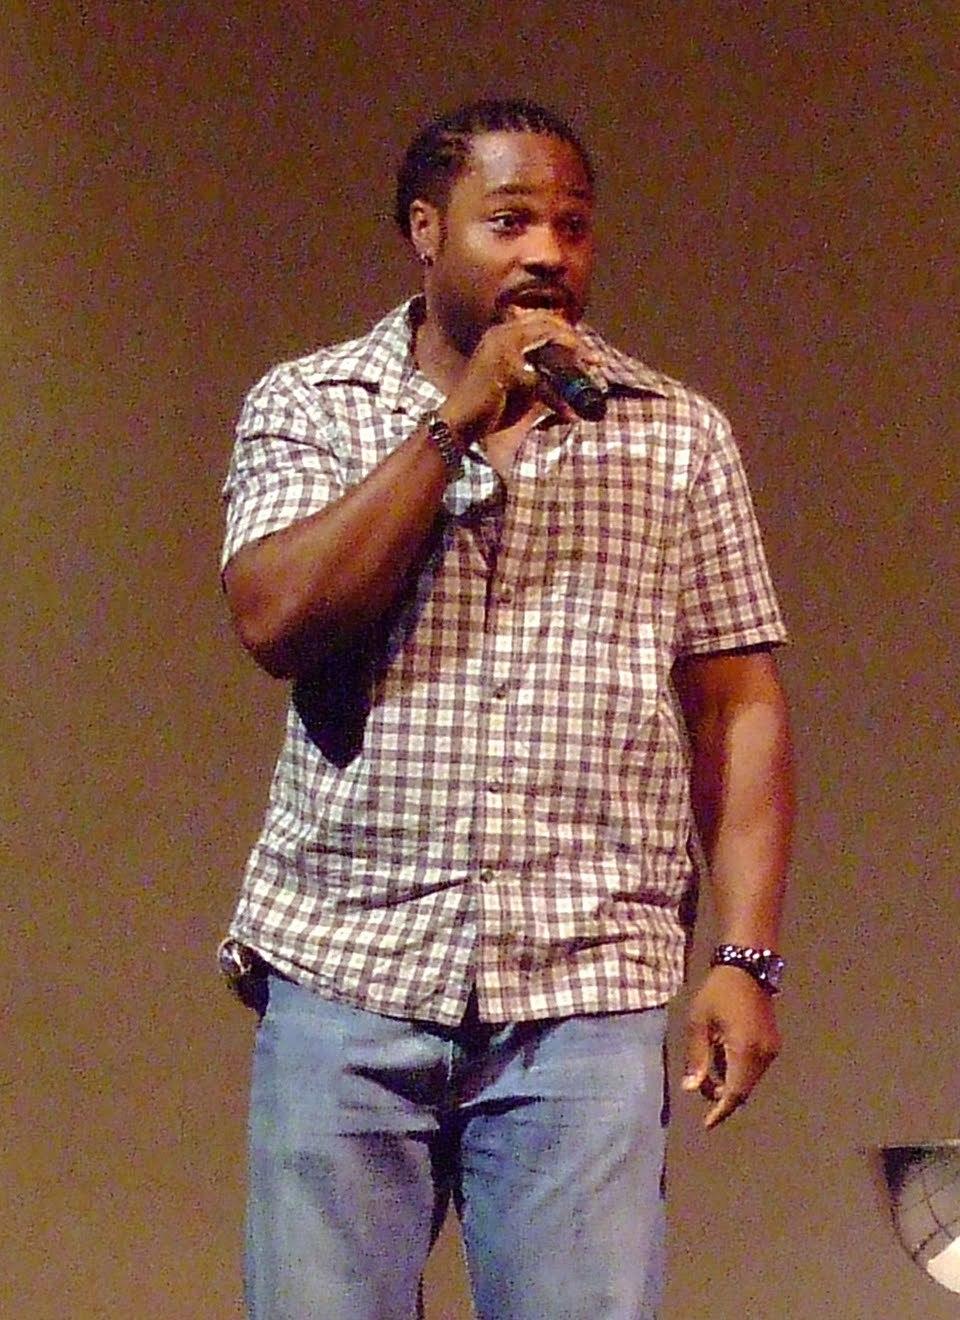 Malcolm-Jamal Warner Net Worth